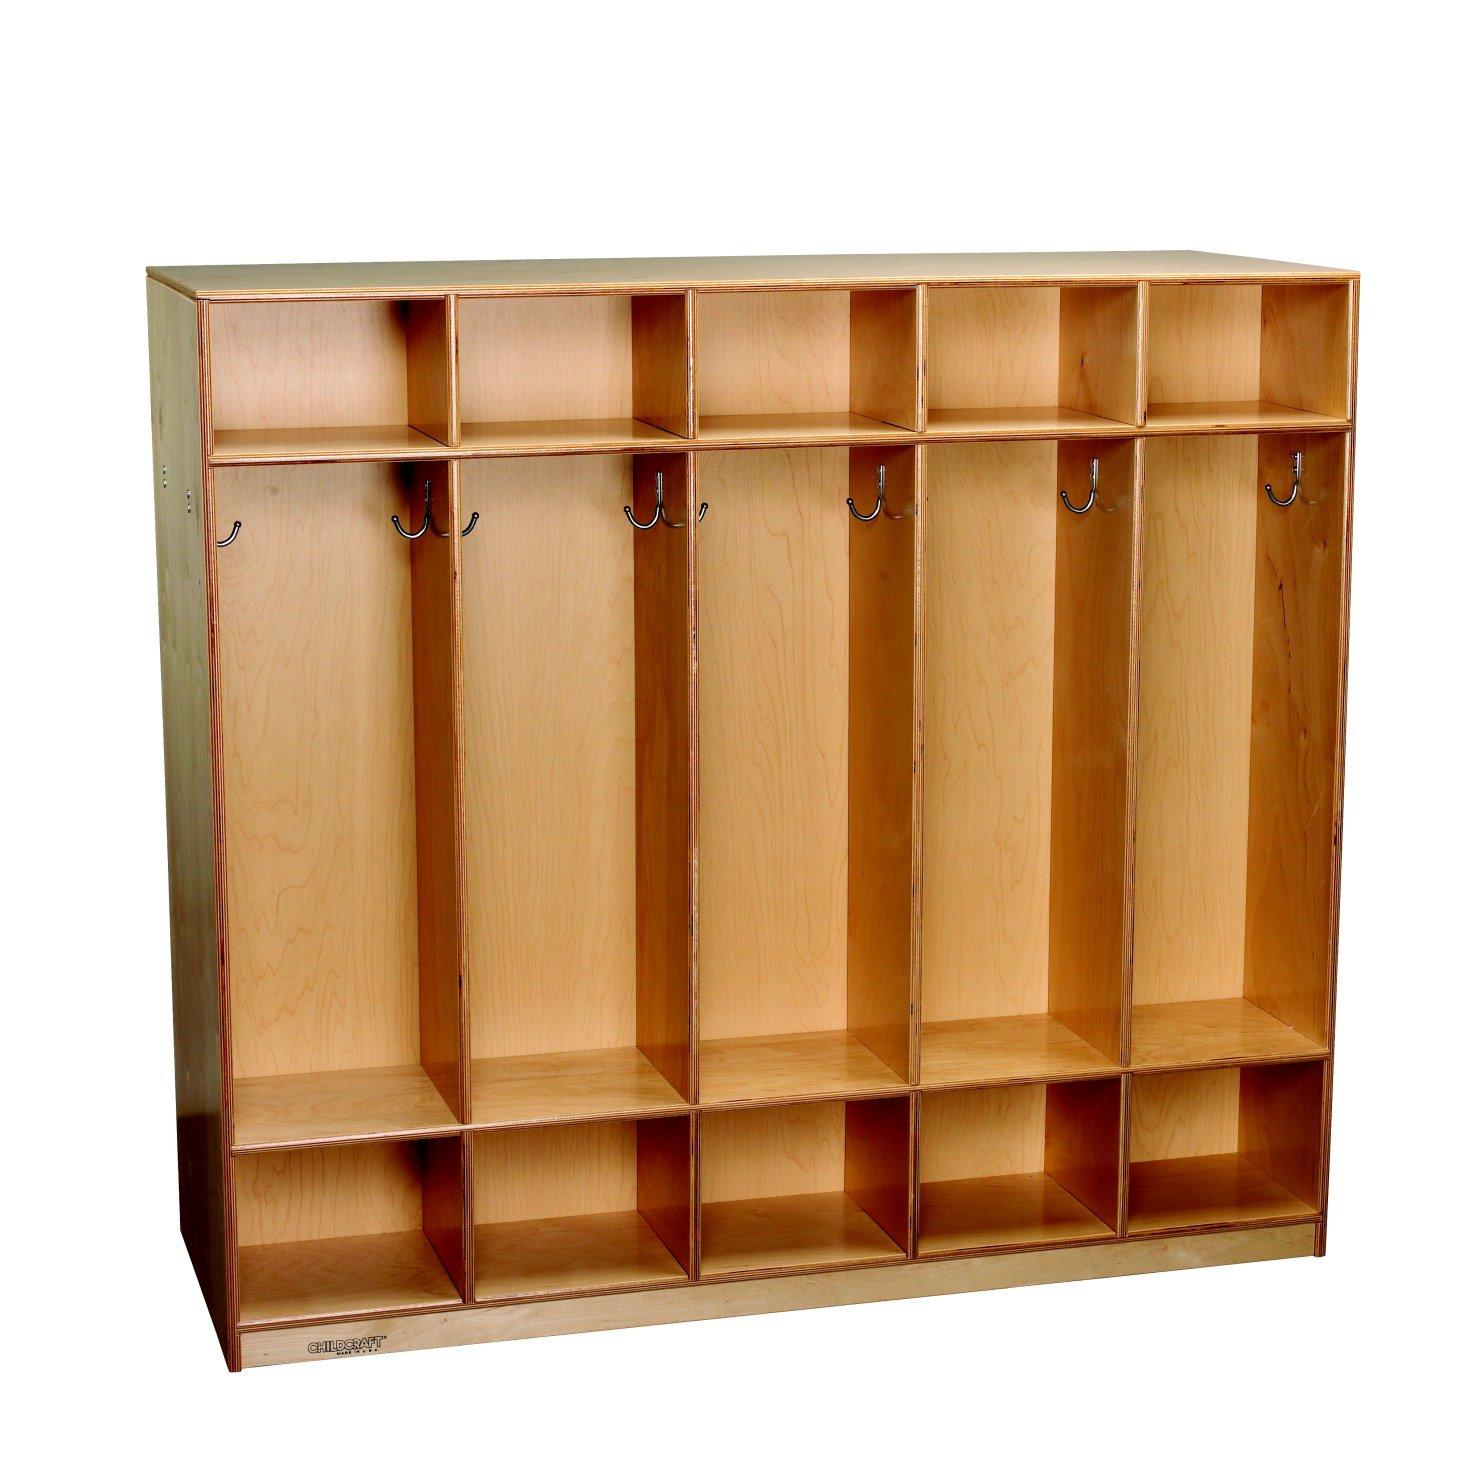 Childcraft 1464146 Double-Sided Coat Locker, Wood, 53-3/4'' x 19-1/2'' x 48'', Natural Wood Tone